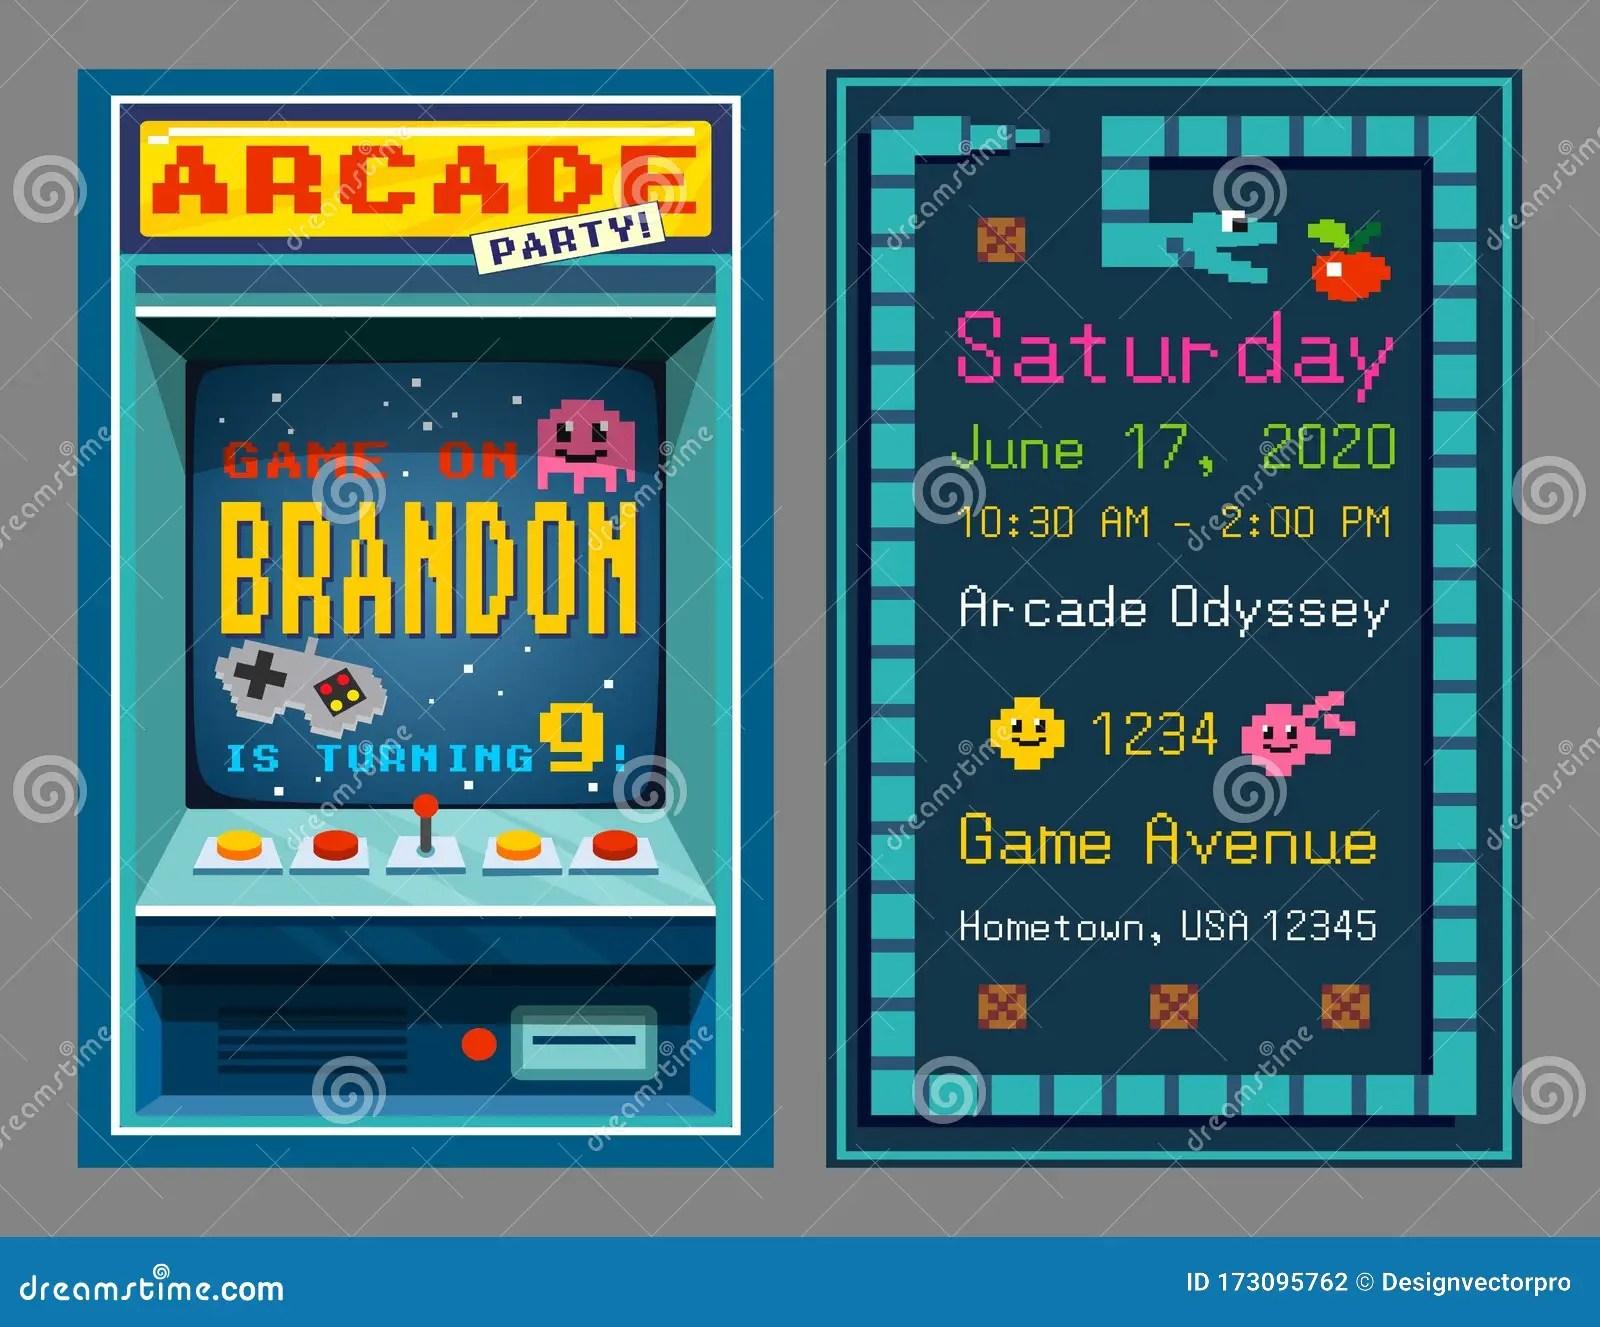 https www dreamstime com birthday party invitation retro style pixel art vector illustration slot machine time place celebration event flat image173095762